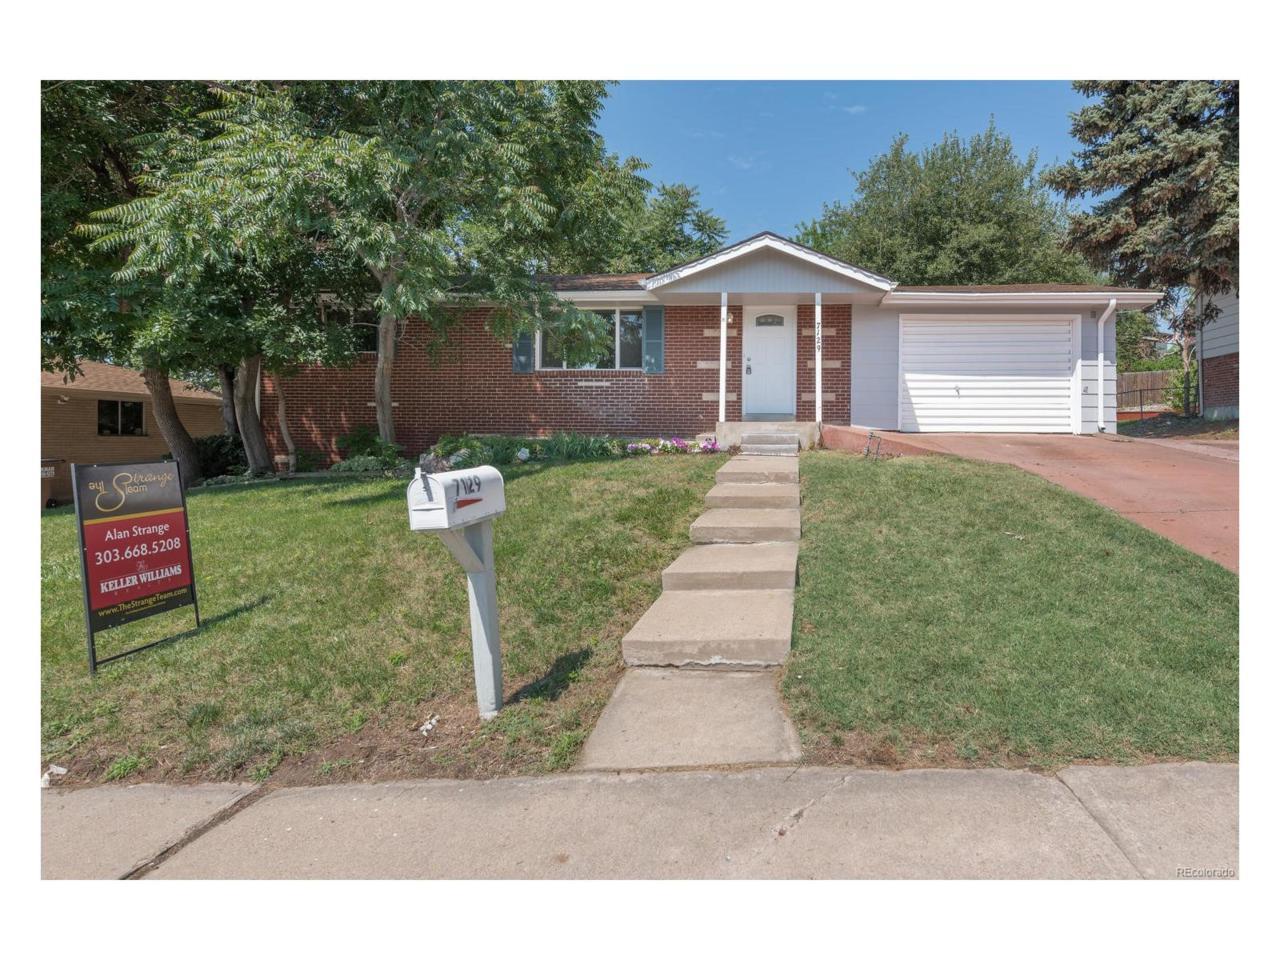 7129 Otis Court, Arvada, CO 80003 (MLS #5935948) :: 8z Real Estate